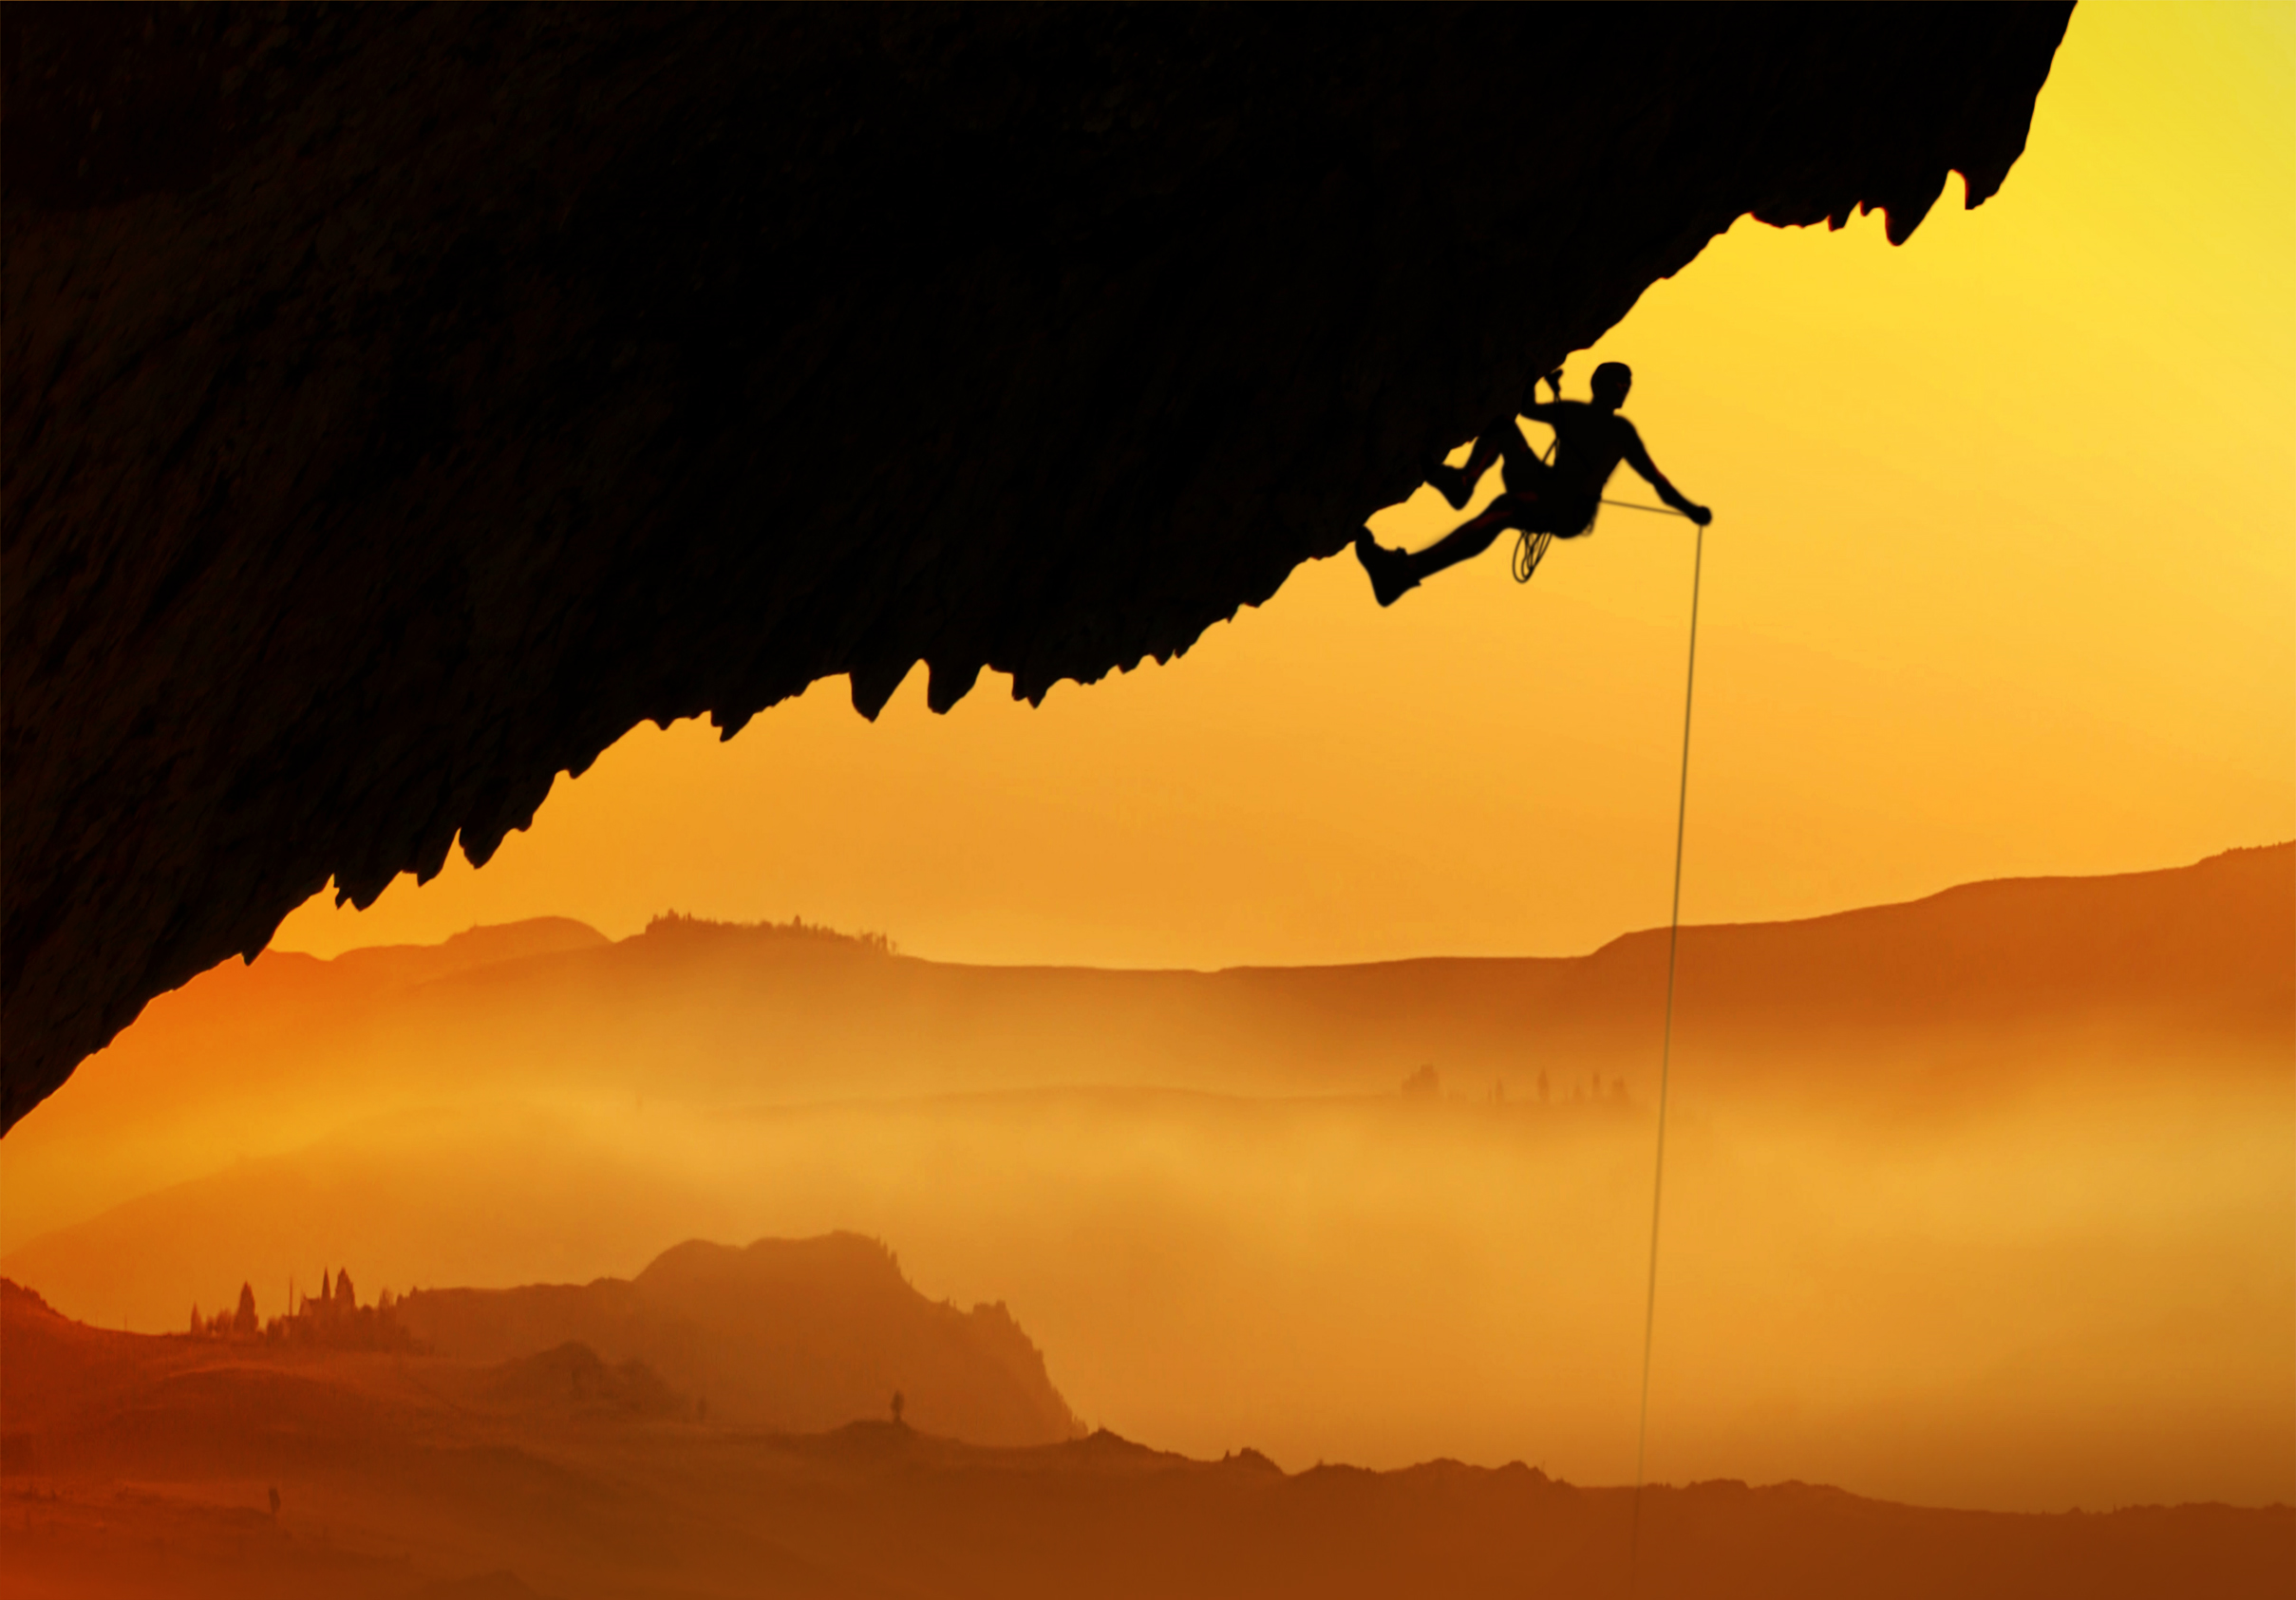 Alpinist - Silhouette at dawn, Acrobat, Orange, Rope, Rock-climbing, HQ Photo